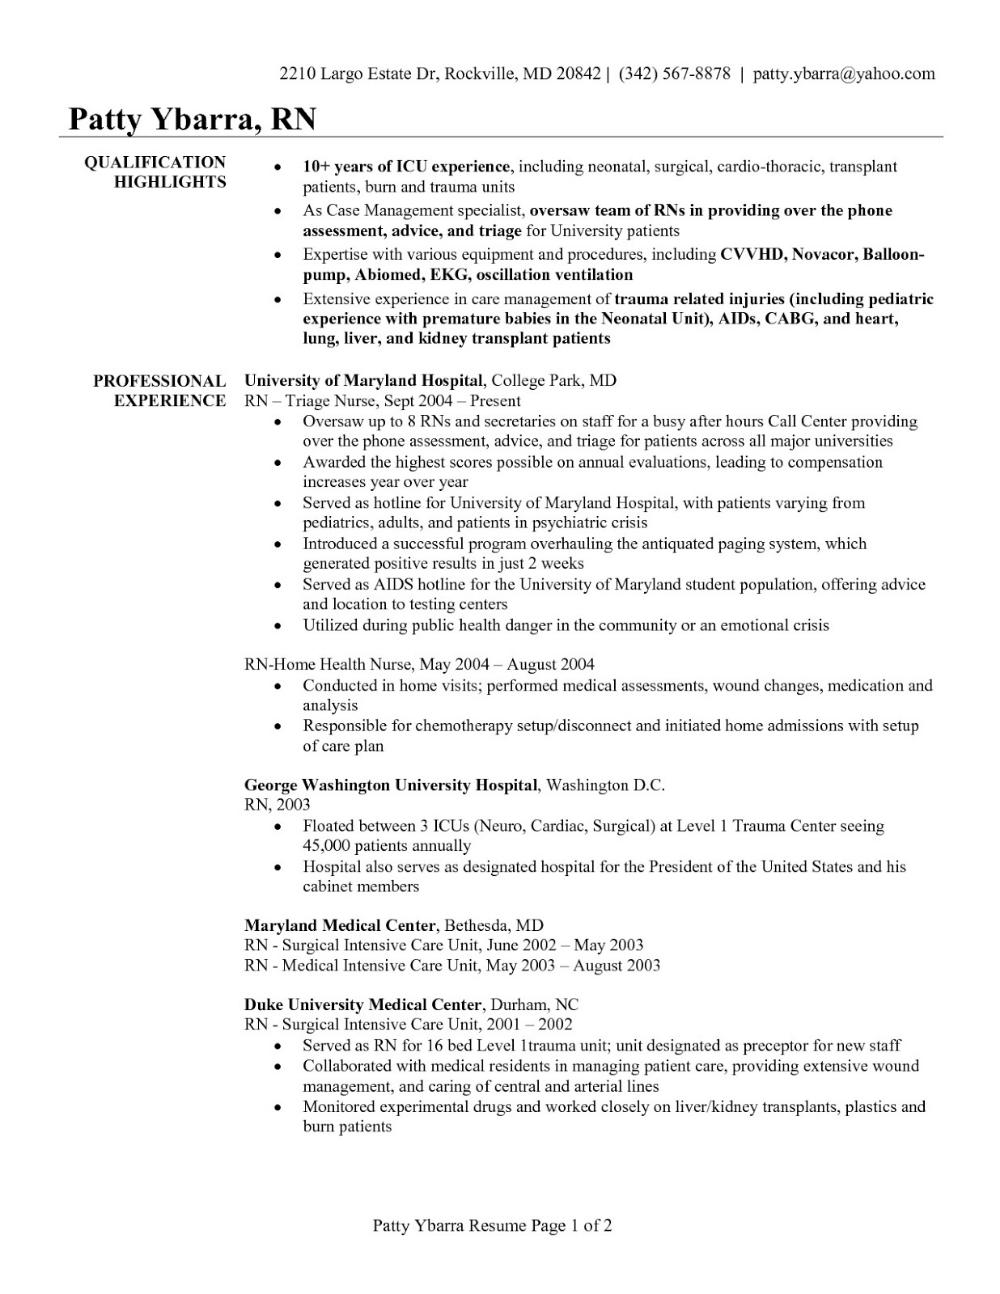 Nuik Noke Executive Resume Templates 2020 Resume Templates Nuik Noke Executive Resume T Nursing Resume Examples Nursing Resume Registered Nurse Resume